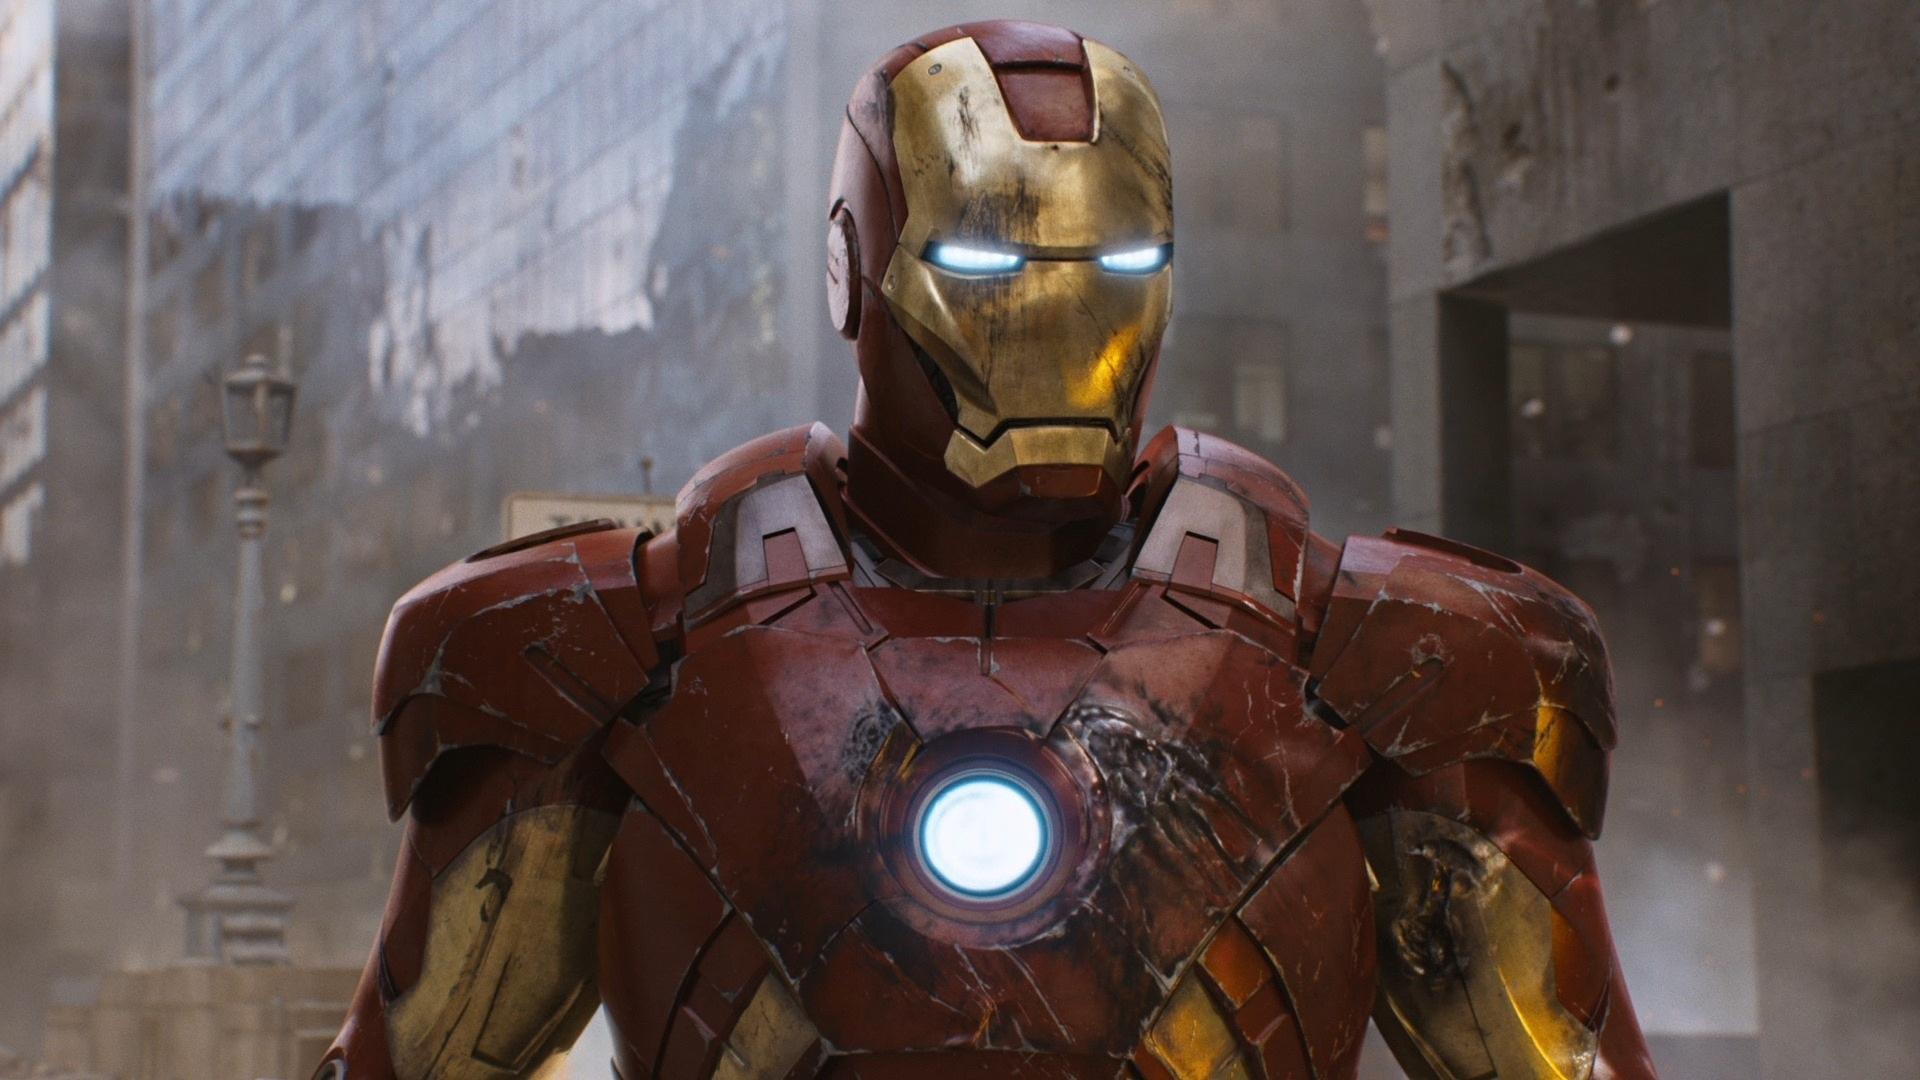 Superheld Iron Man In The Avengers 1920x1080 Full Hd 2k